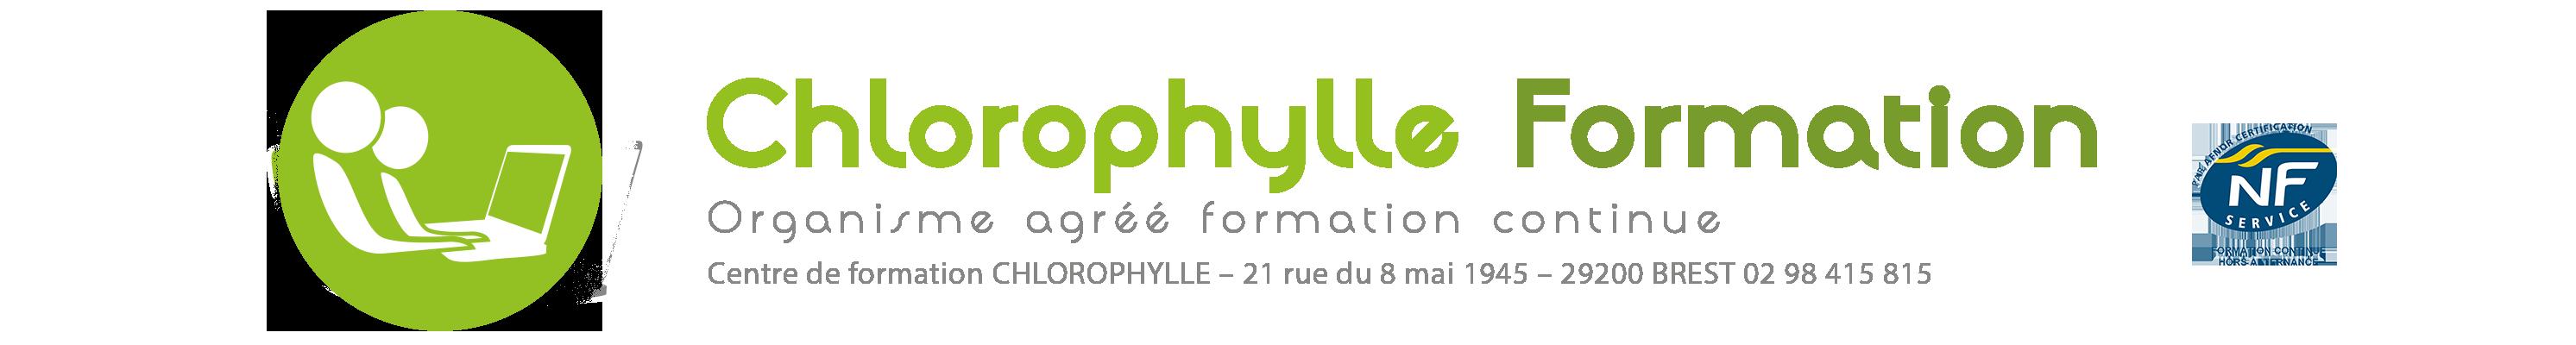 Chlorophylle Formations